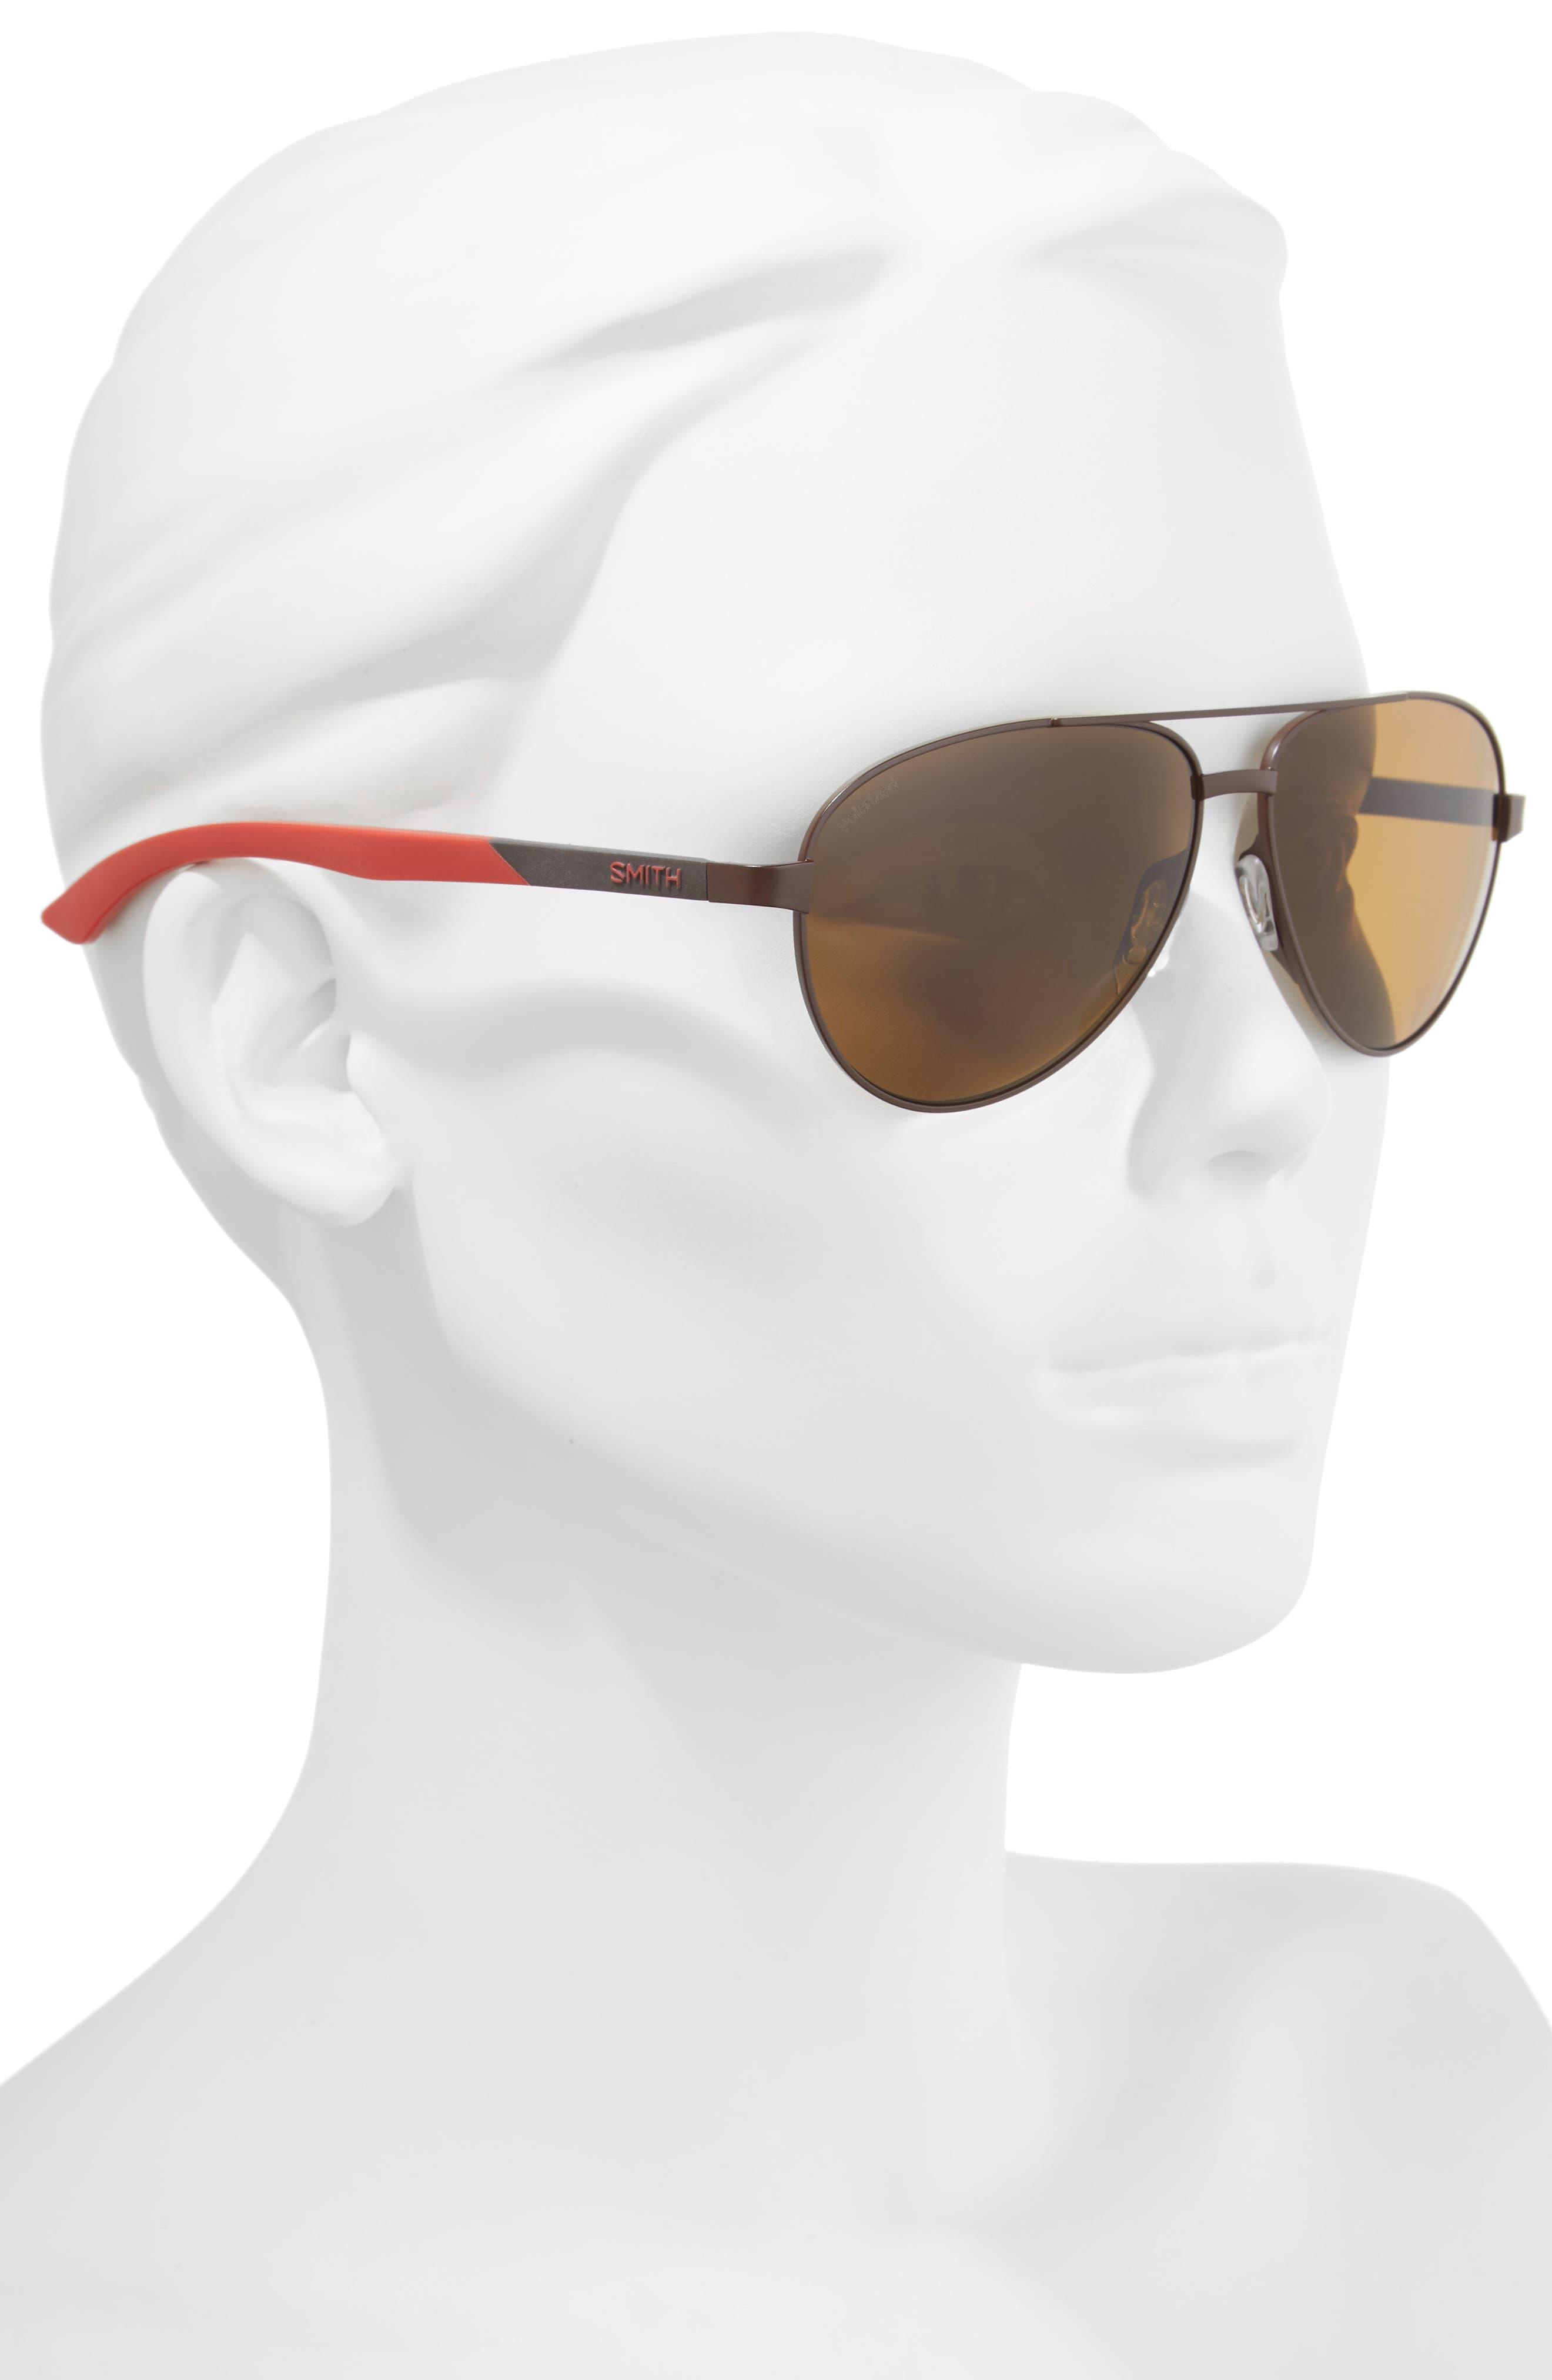 Salute 59mm Polarized Aviator Sunglasses,                             Alternate thumbnail 2, color,                             200